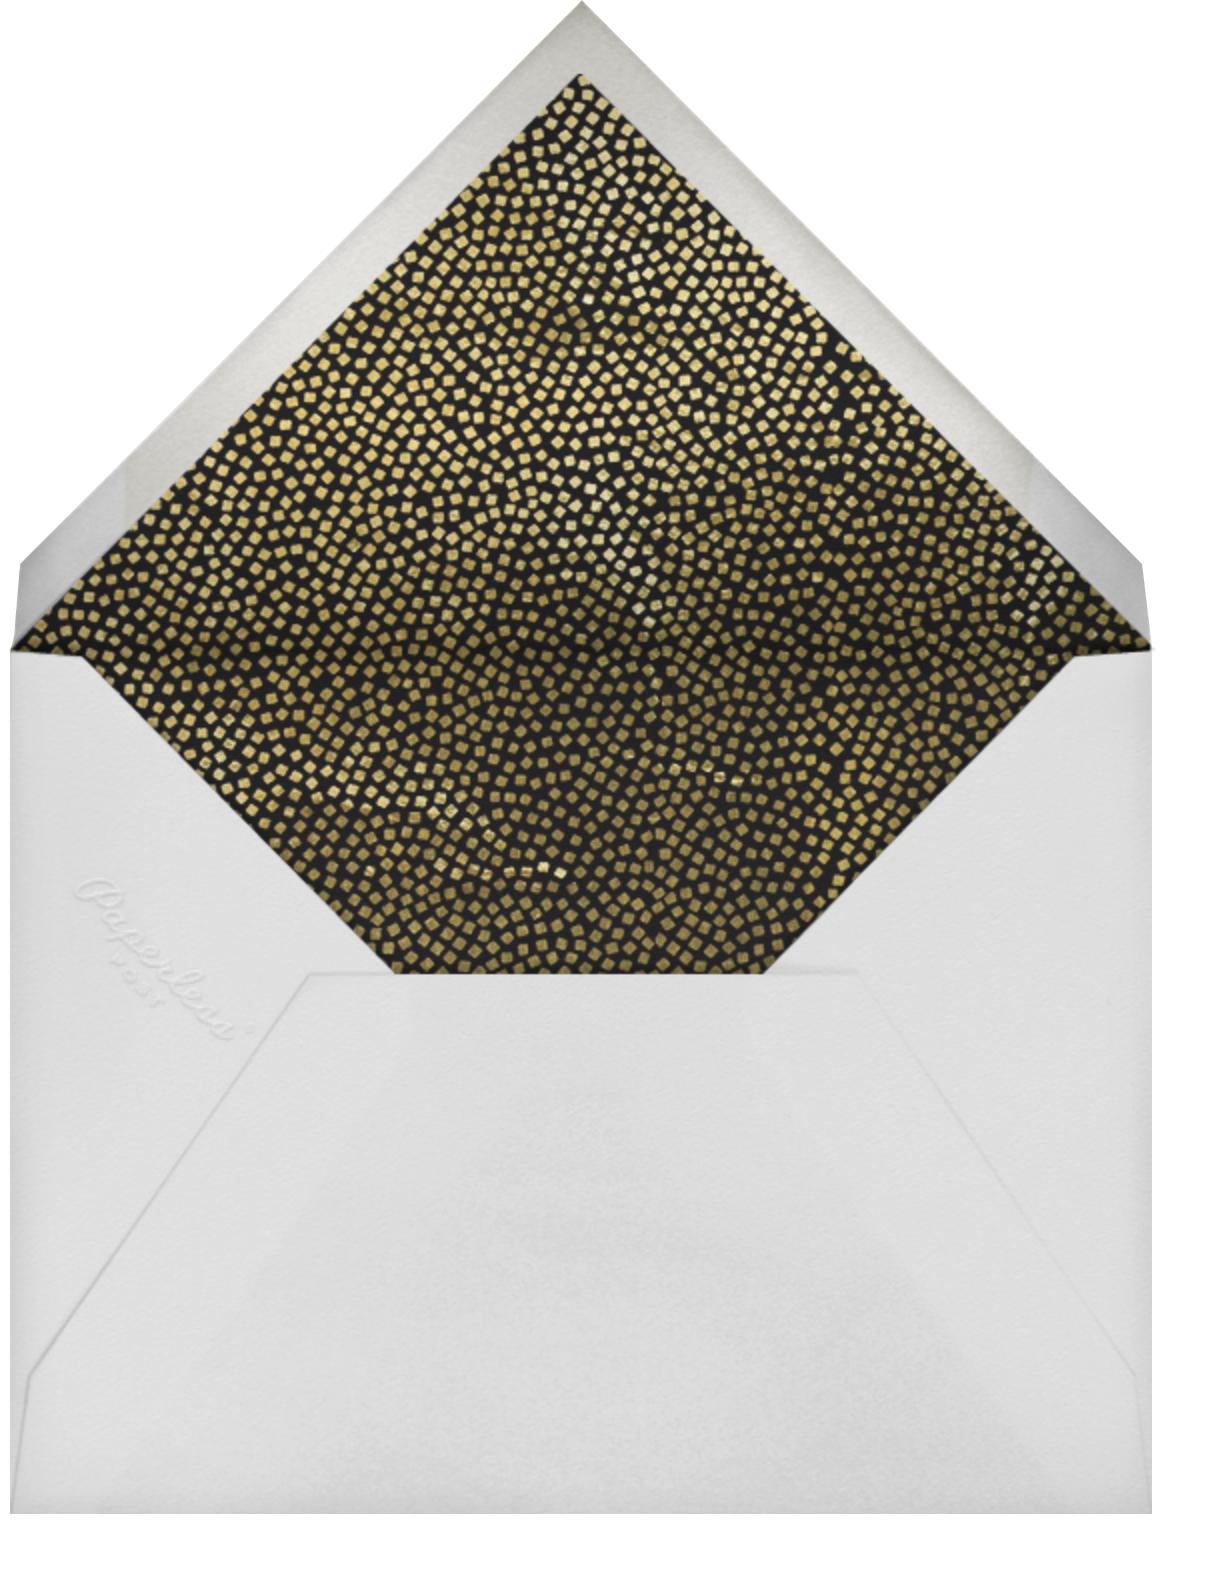 Konfetti (Photo) - Gold - Kelly Wearstler - Envelope